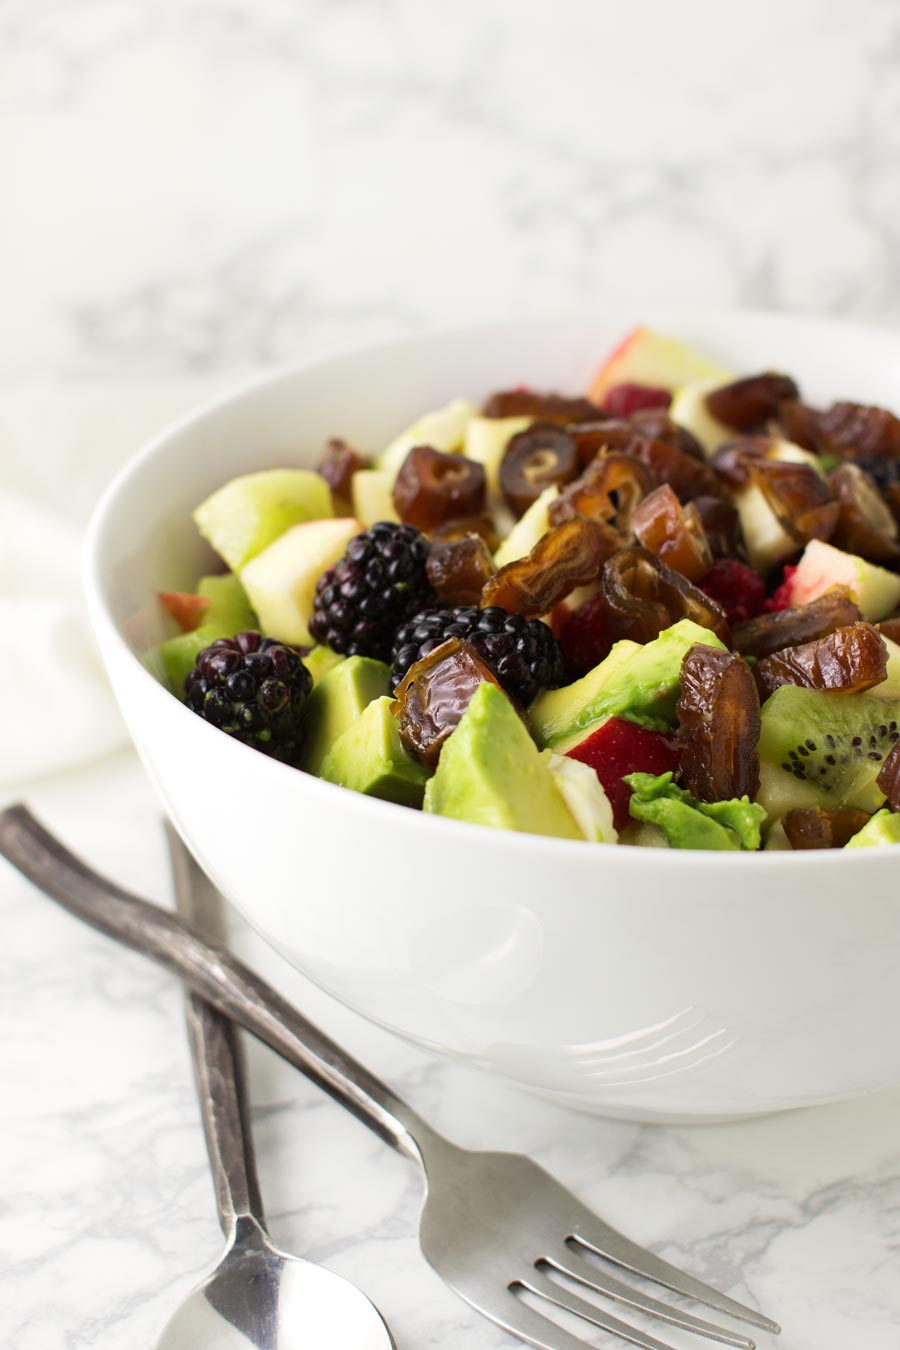 Fruit Salad recipe from acleanplate.com #paleo #aip #glutenfree